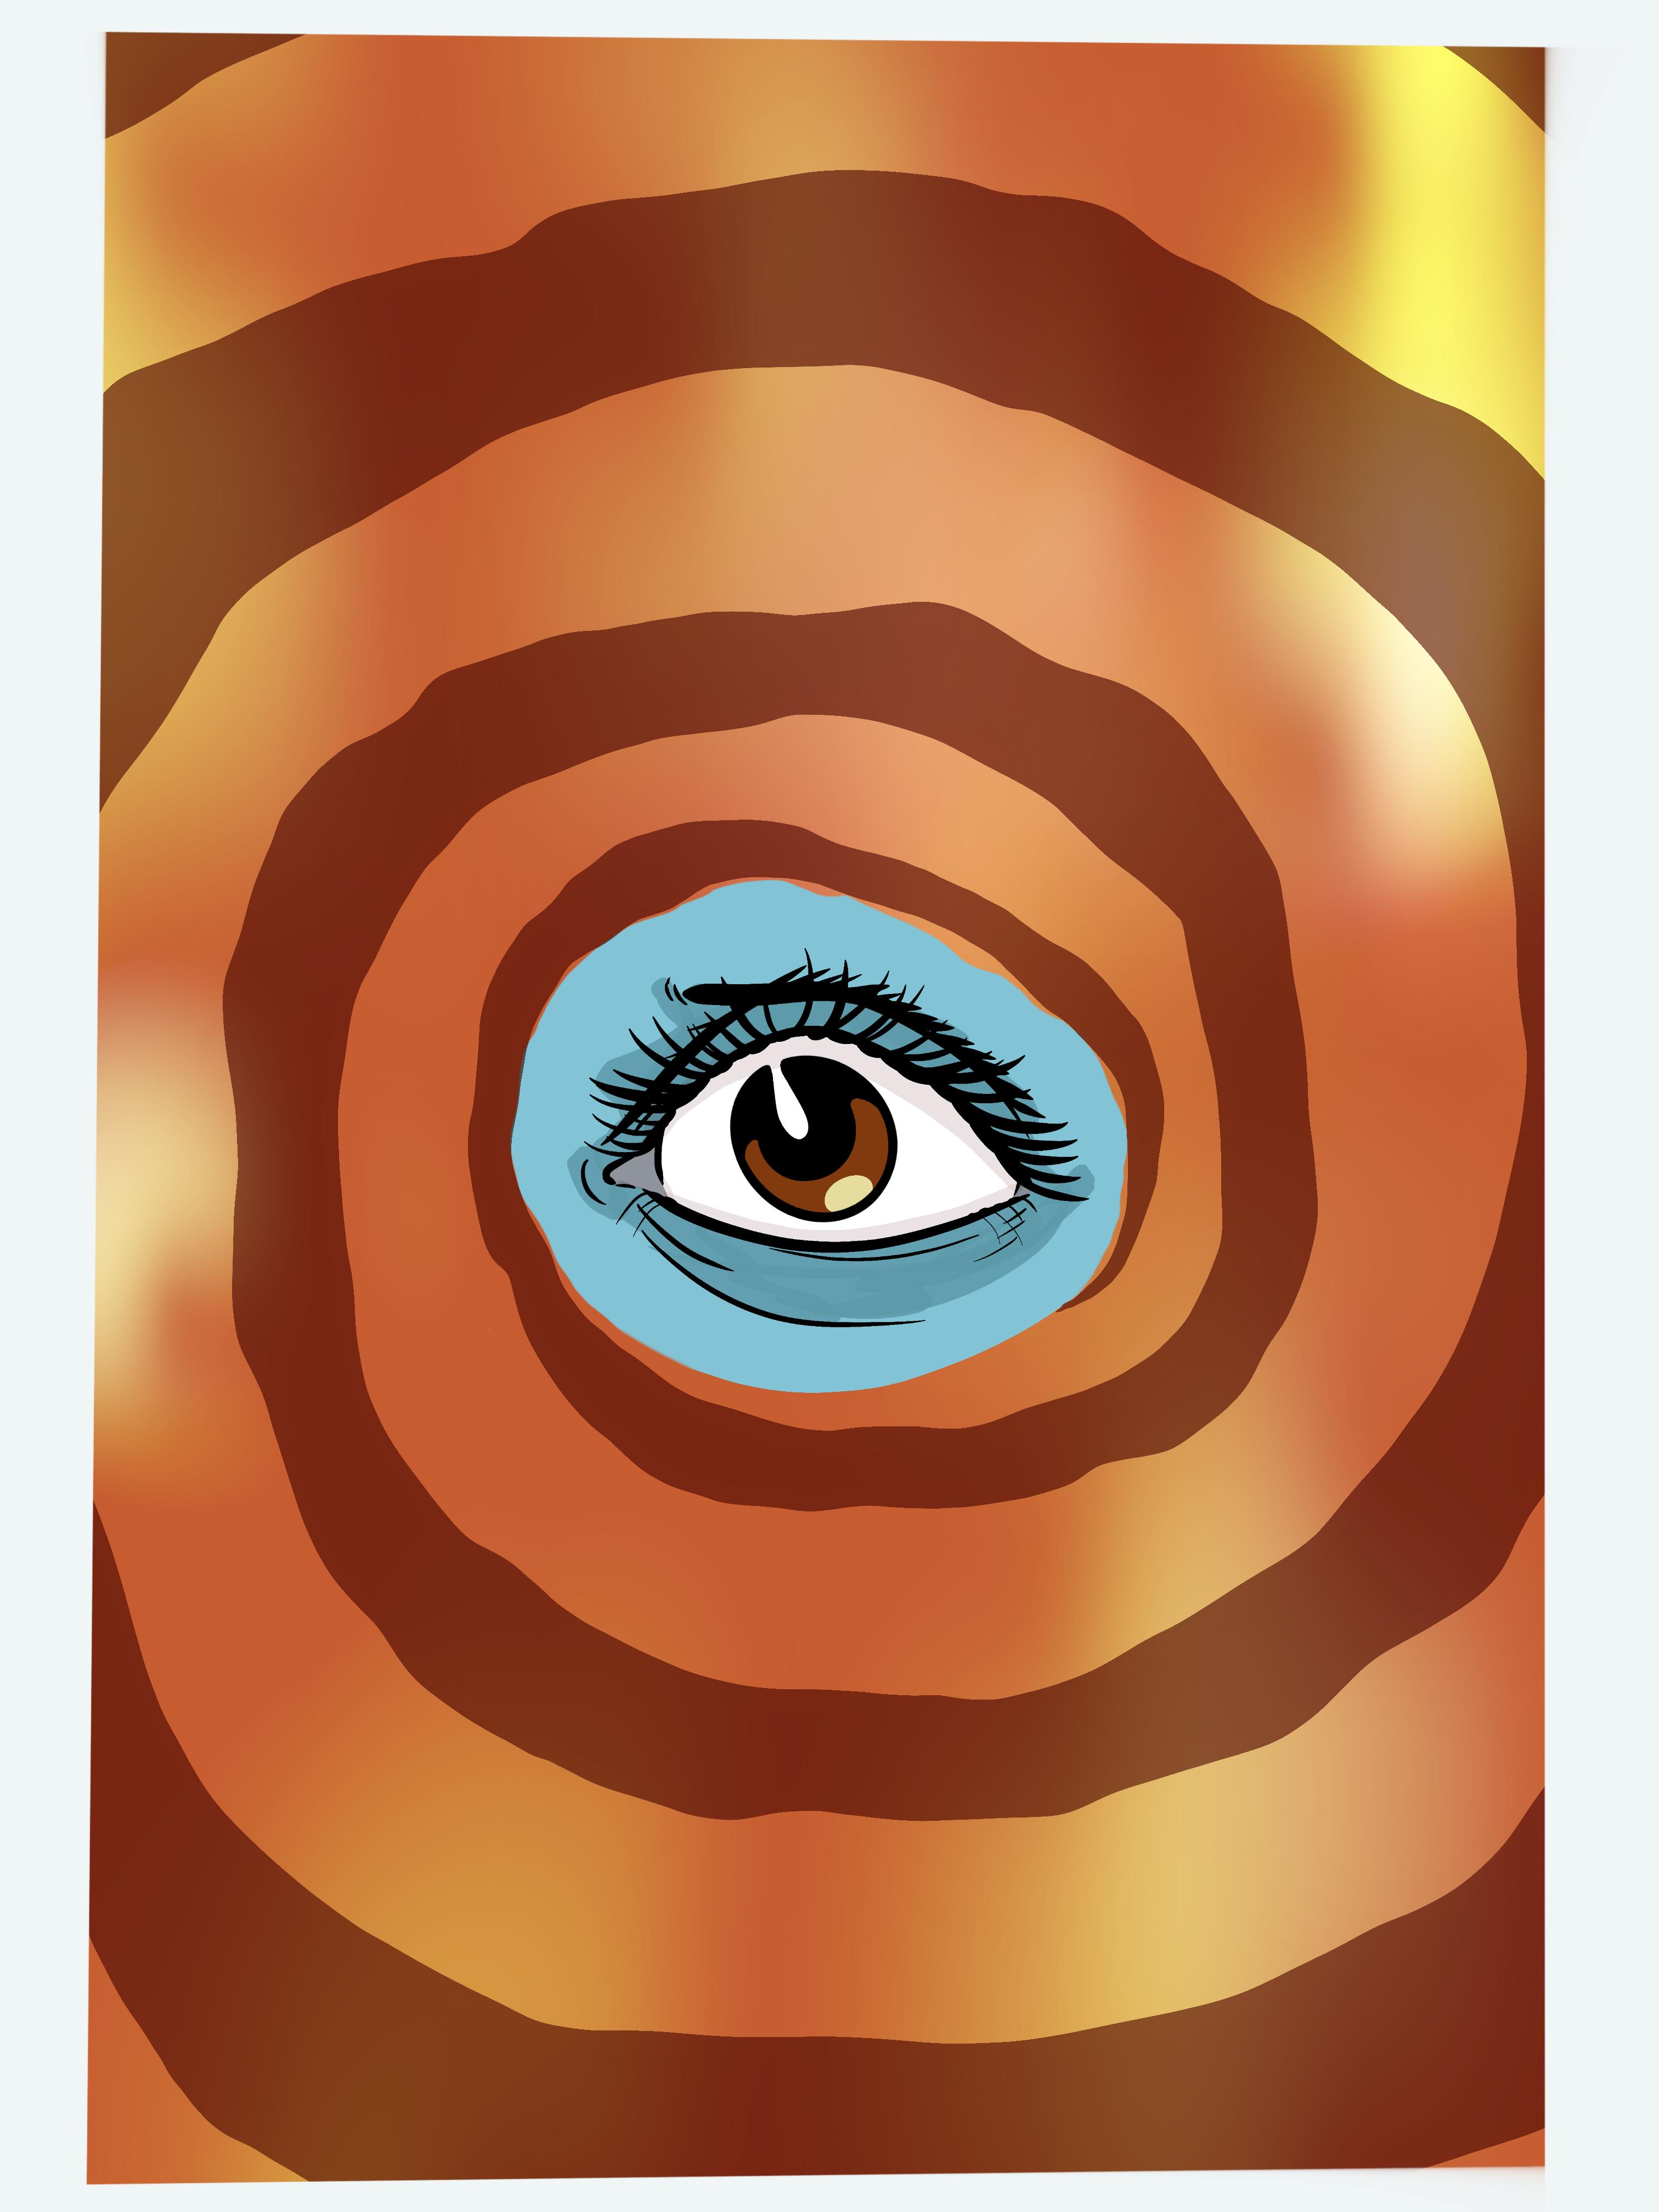 Uneasy eye digital drawing